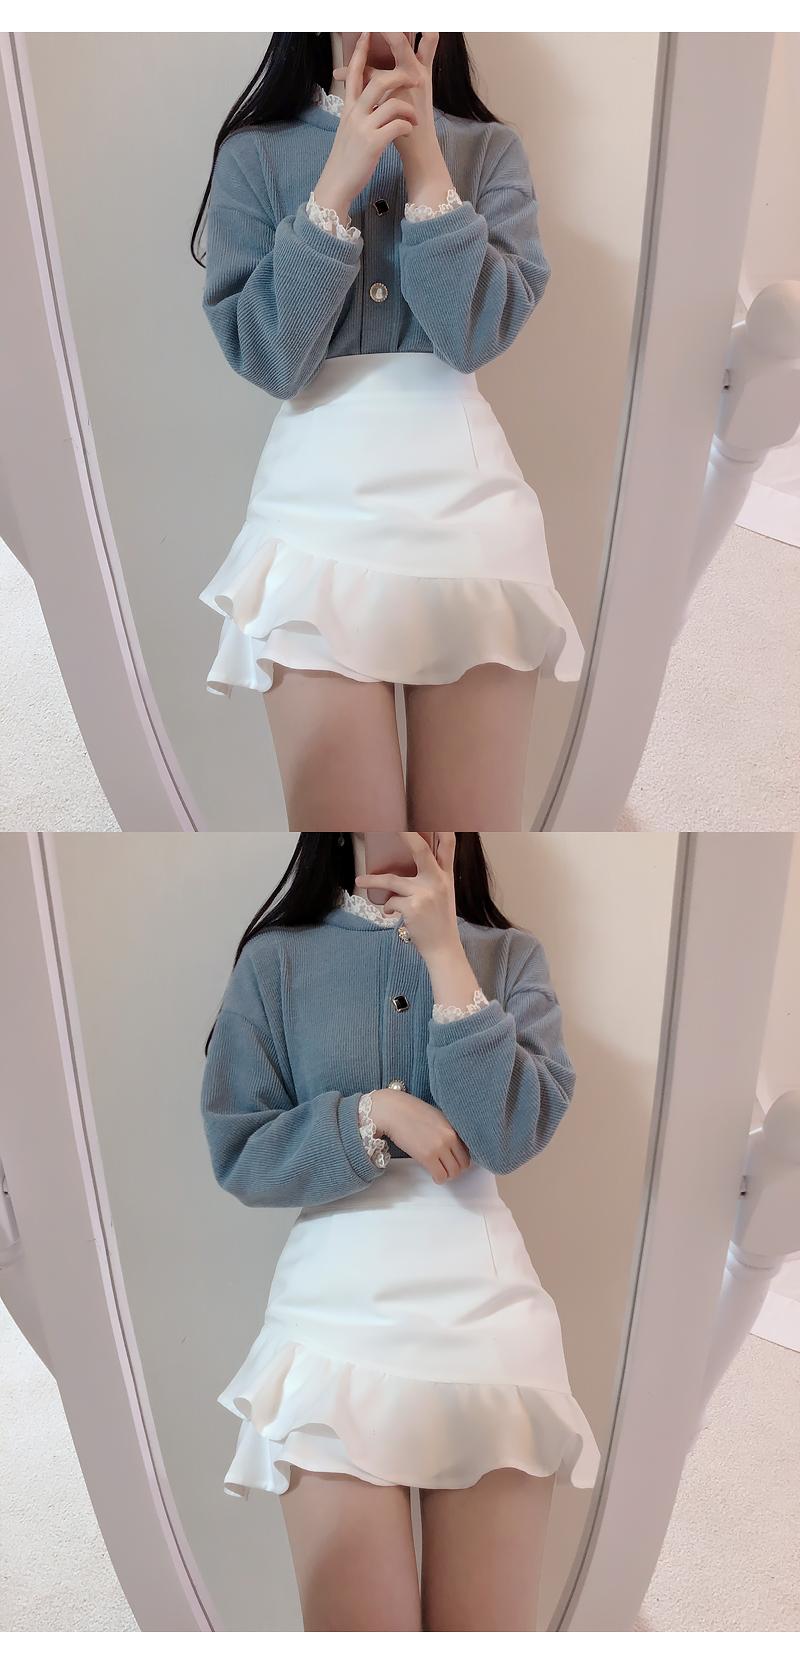 Self-made ♥ Order runaway! Life jewelry knit cardigan